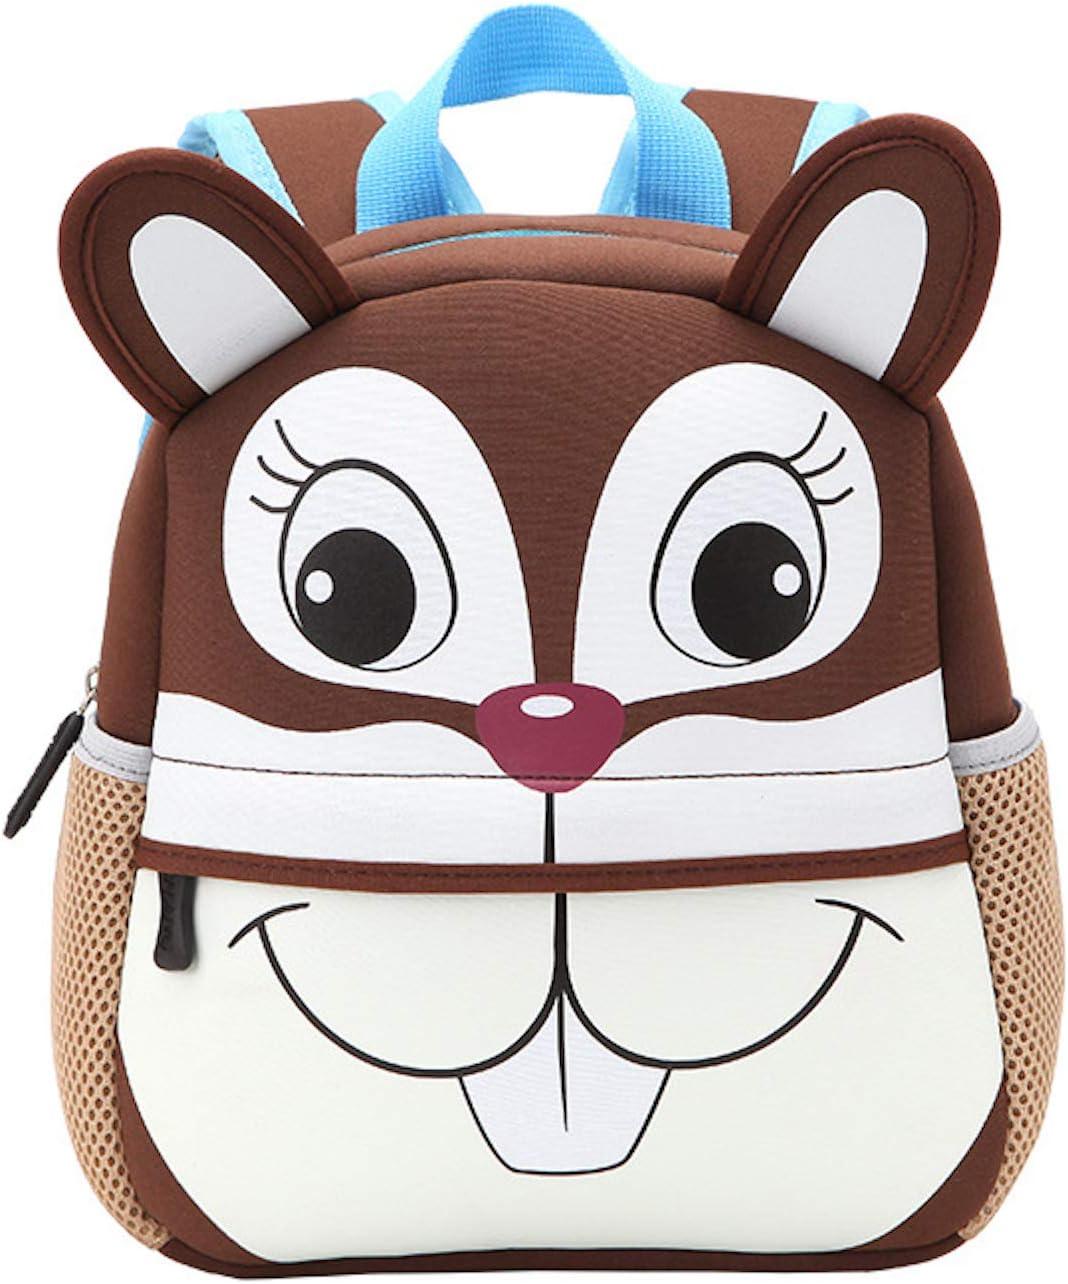 ZumZup KidsBackpacks Waterproof for Toddler Little Kids Cute Animals Backpack Squirrel S